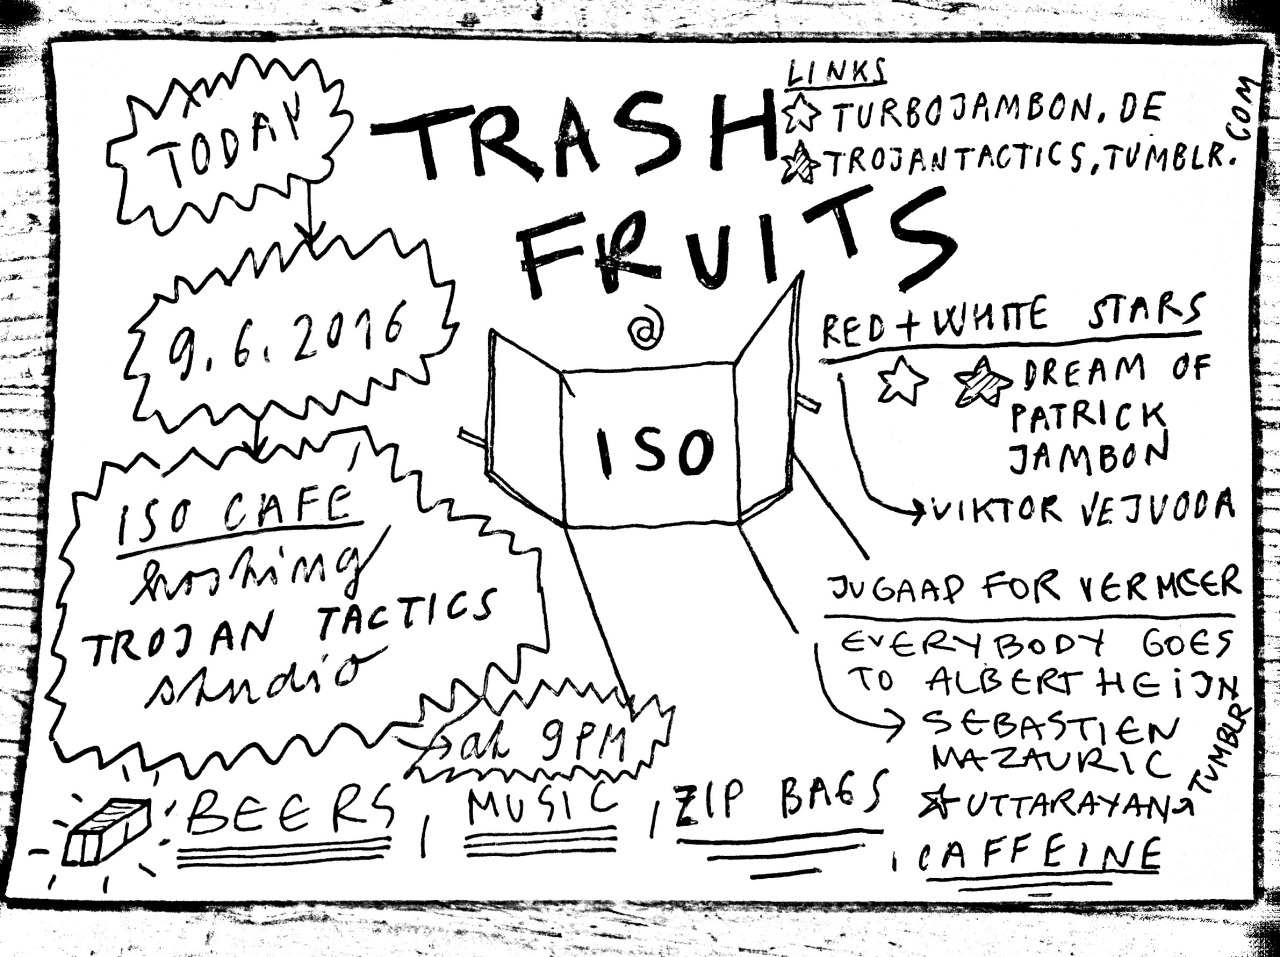 ISO hosting Trojan Tactics studio TRASH FRUITS 9